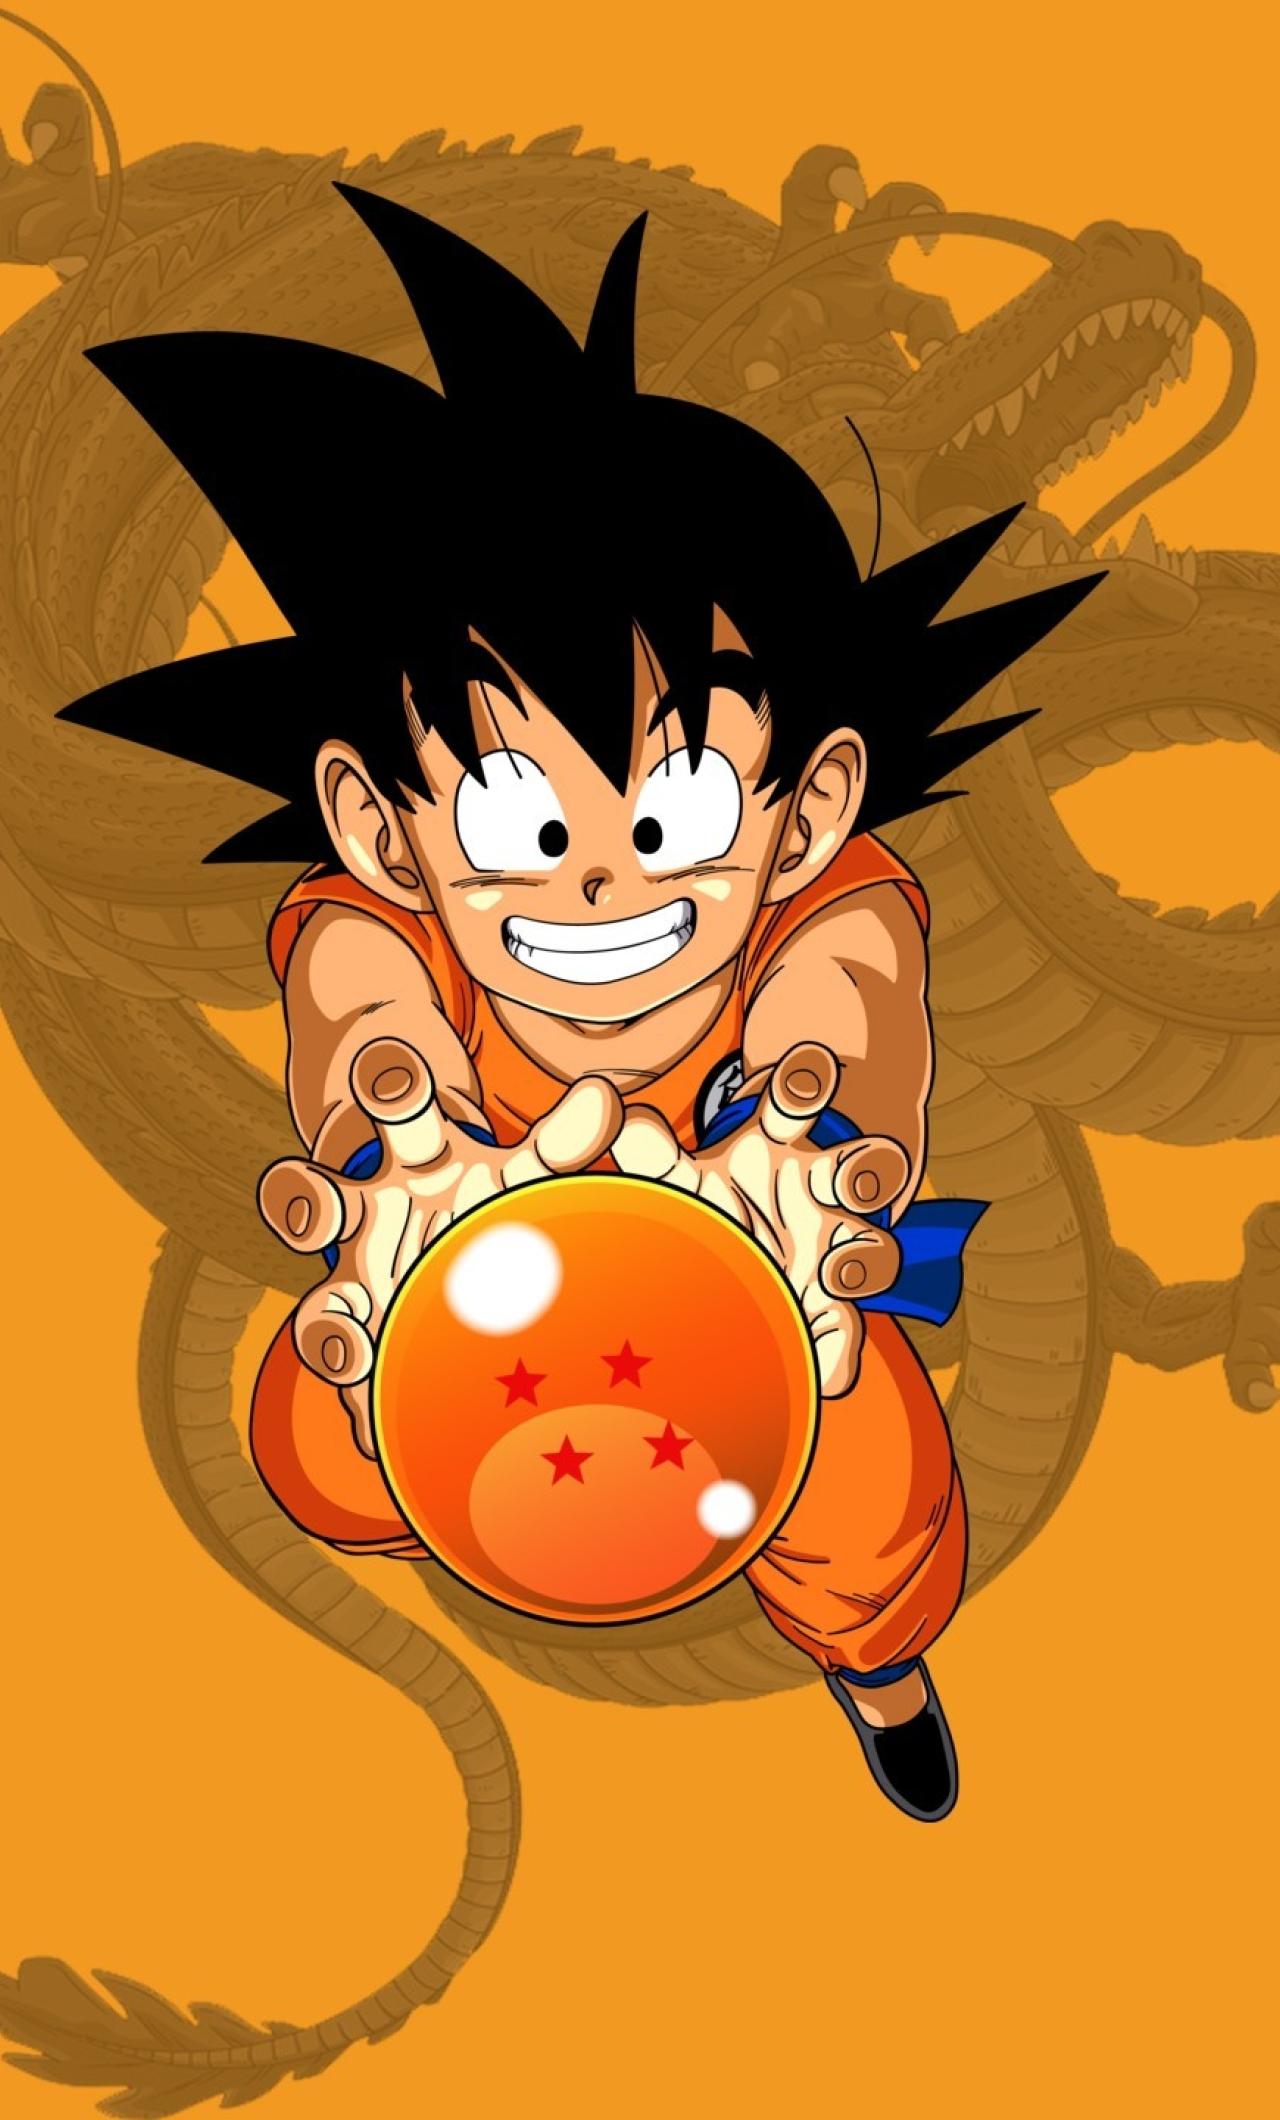 1280x2120 Kid Goku Dragon Ball Z Iphone 6 Plus Wallpaper Hd